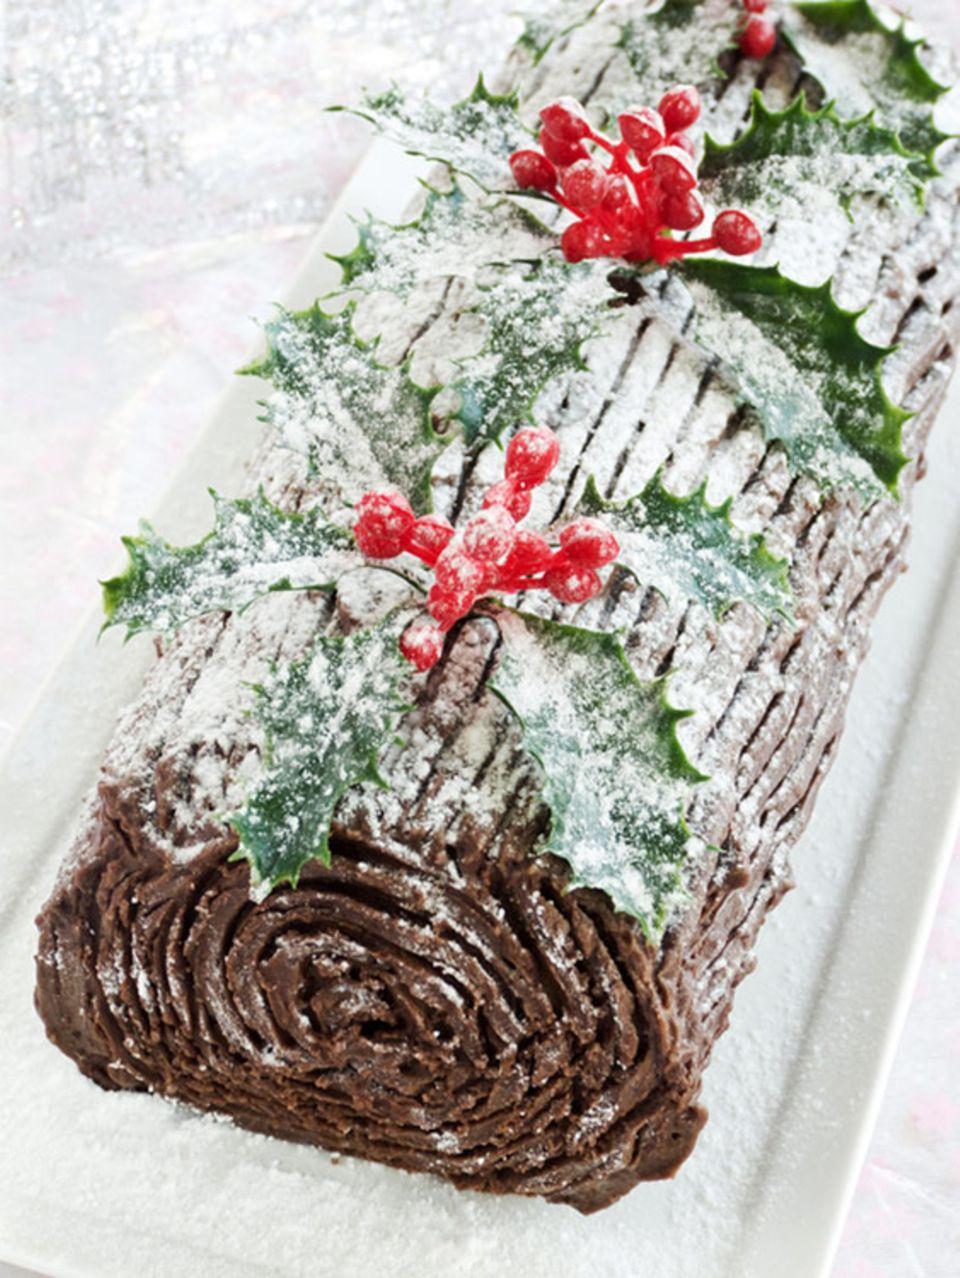 Essbarer Holzscheit: Bûche de Noël